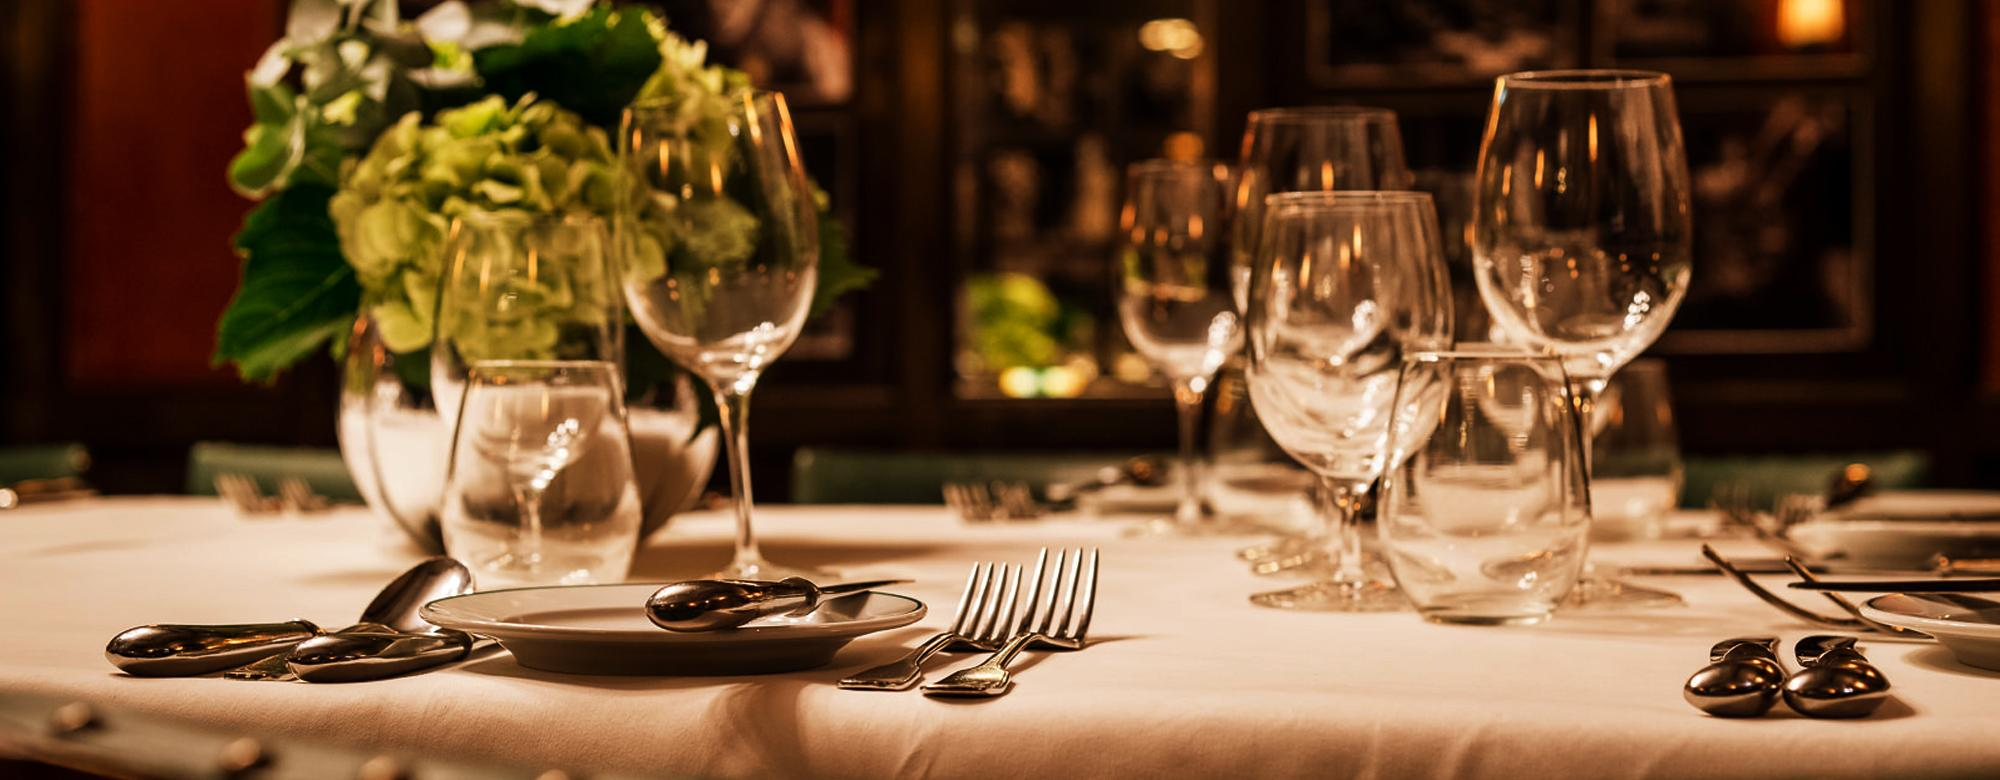 The Ivy Restaurant Interior